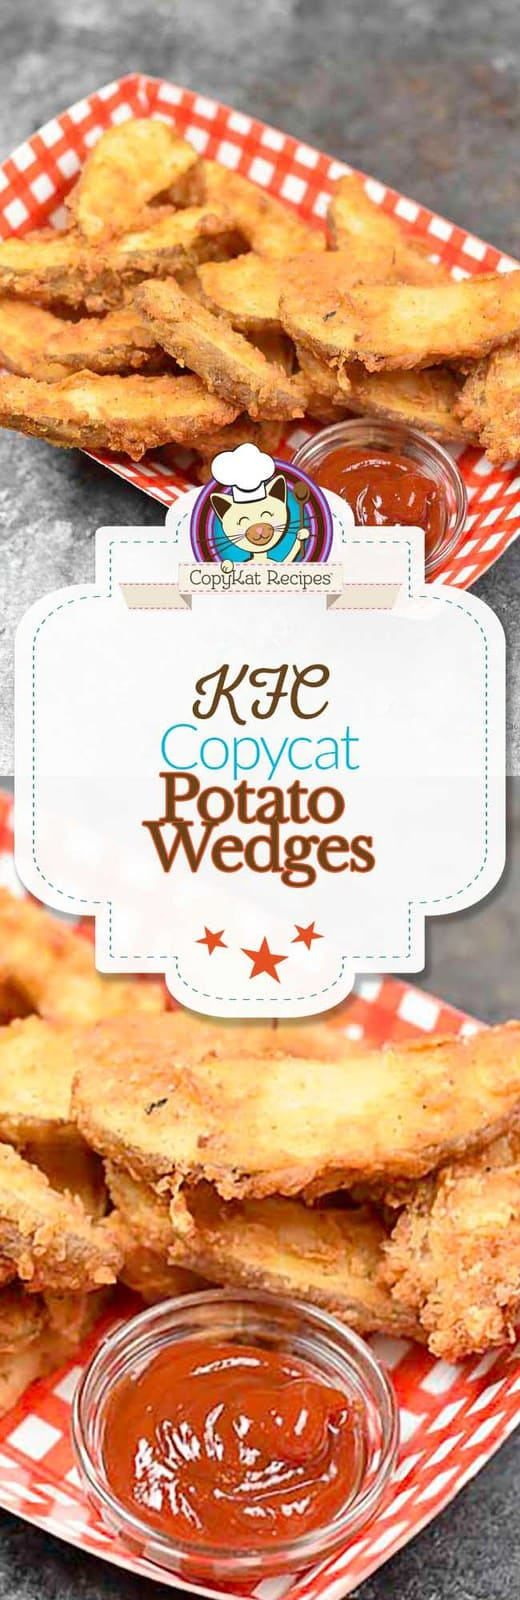 Homemade Copycat KFC Potato Wedges Kfc Fried Potato Wedges